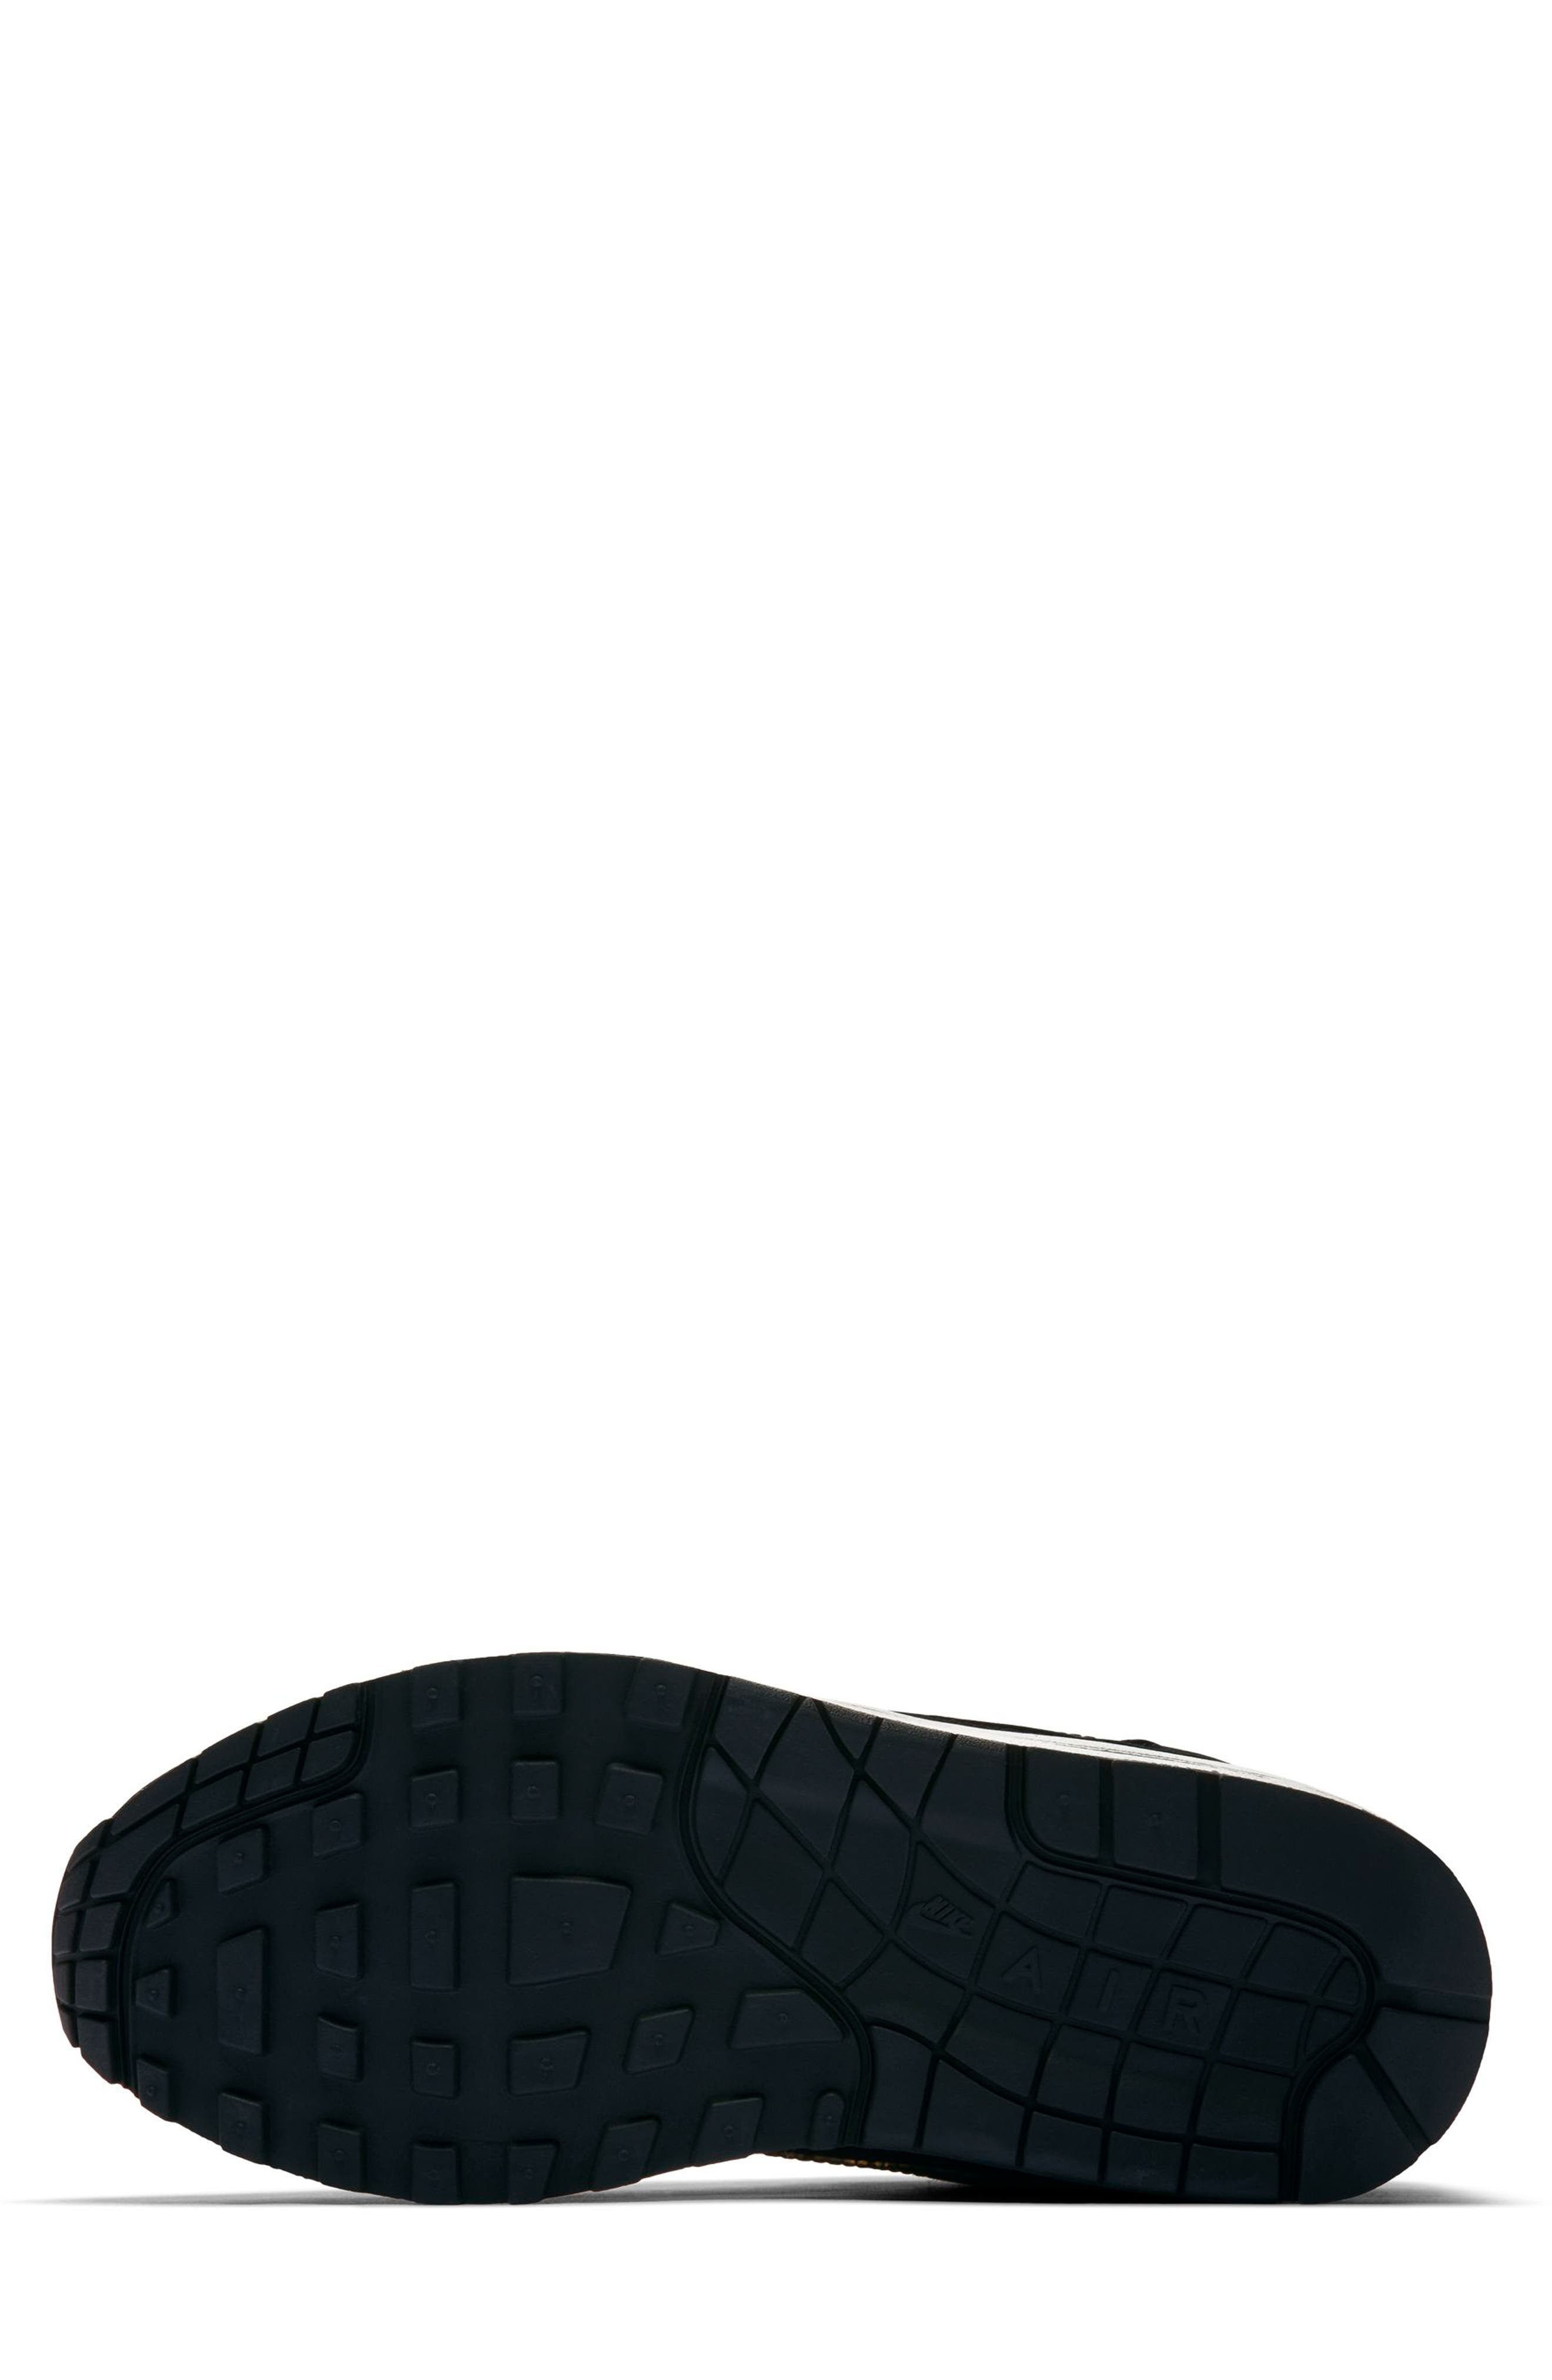 Air Max 1 SE Sneaker,                             Alternate thumbnail 5, color,                             BLACK/ BLACK/ UNIVERSITY RED